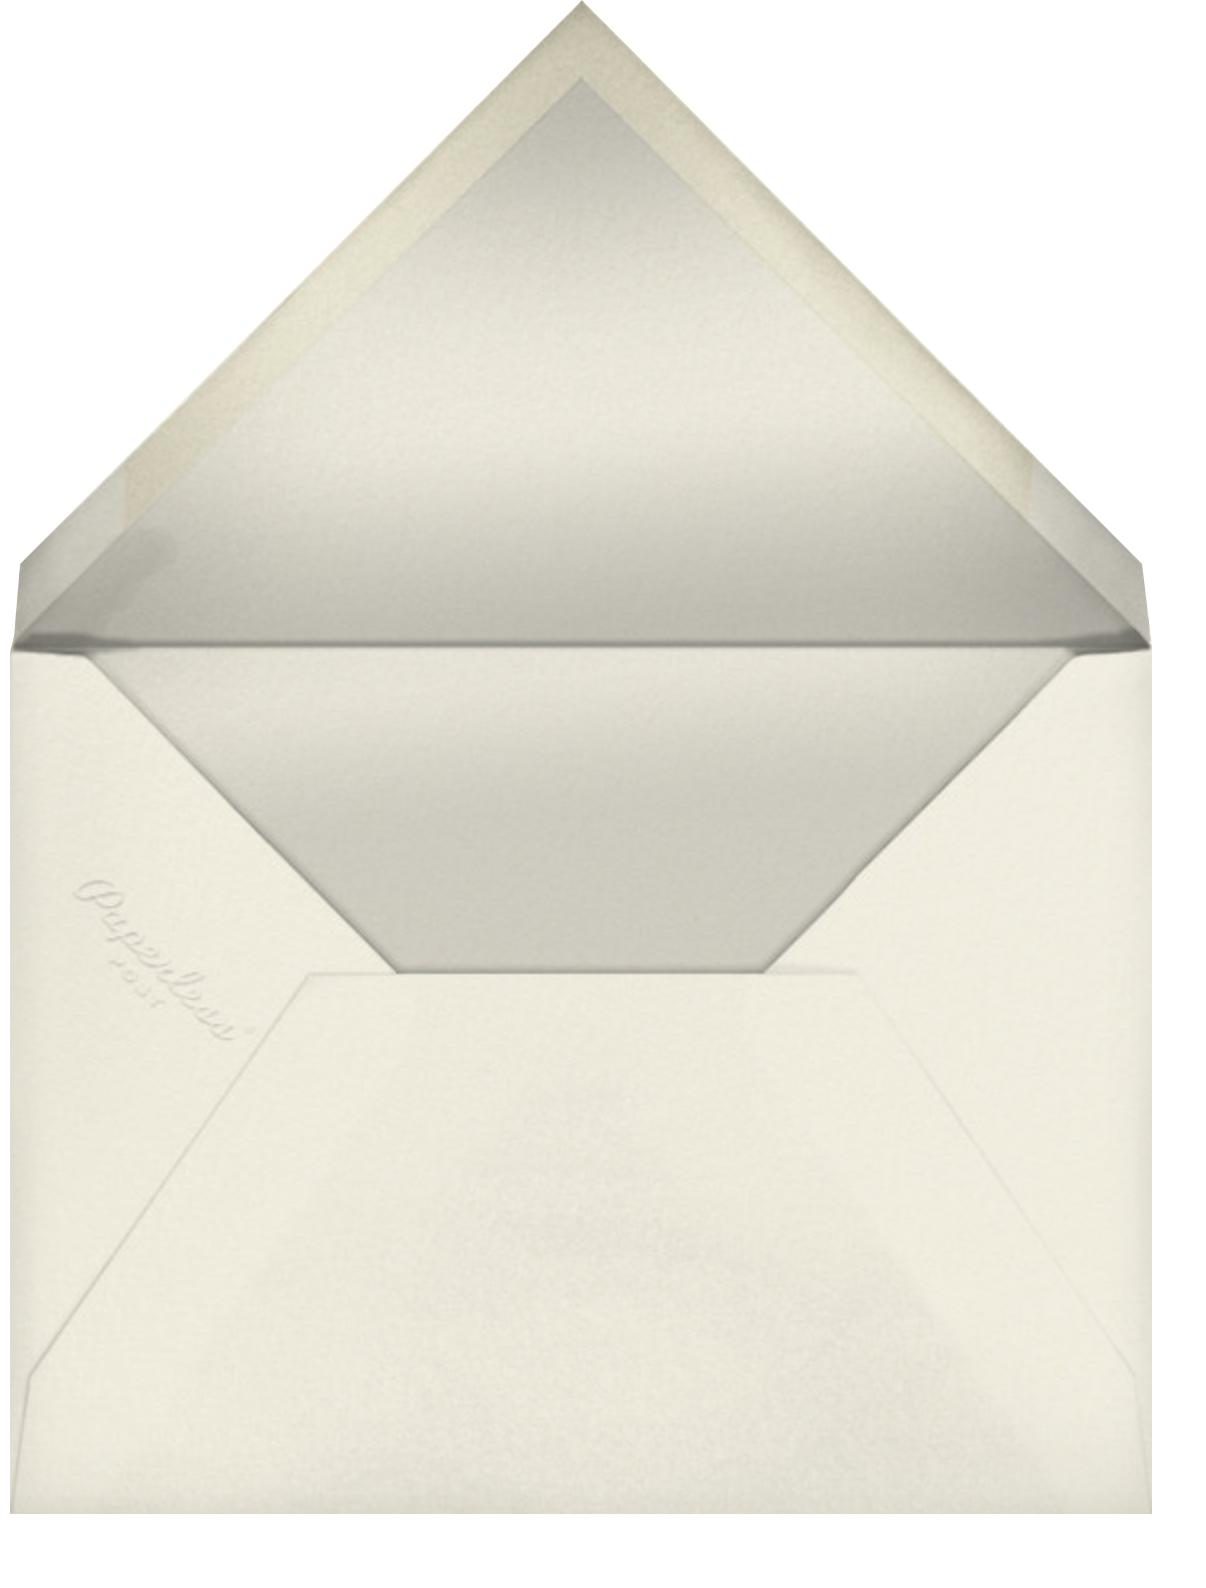 Crete (Bright Seafoam) - Paperless Post - Envelope